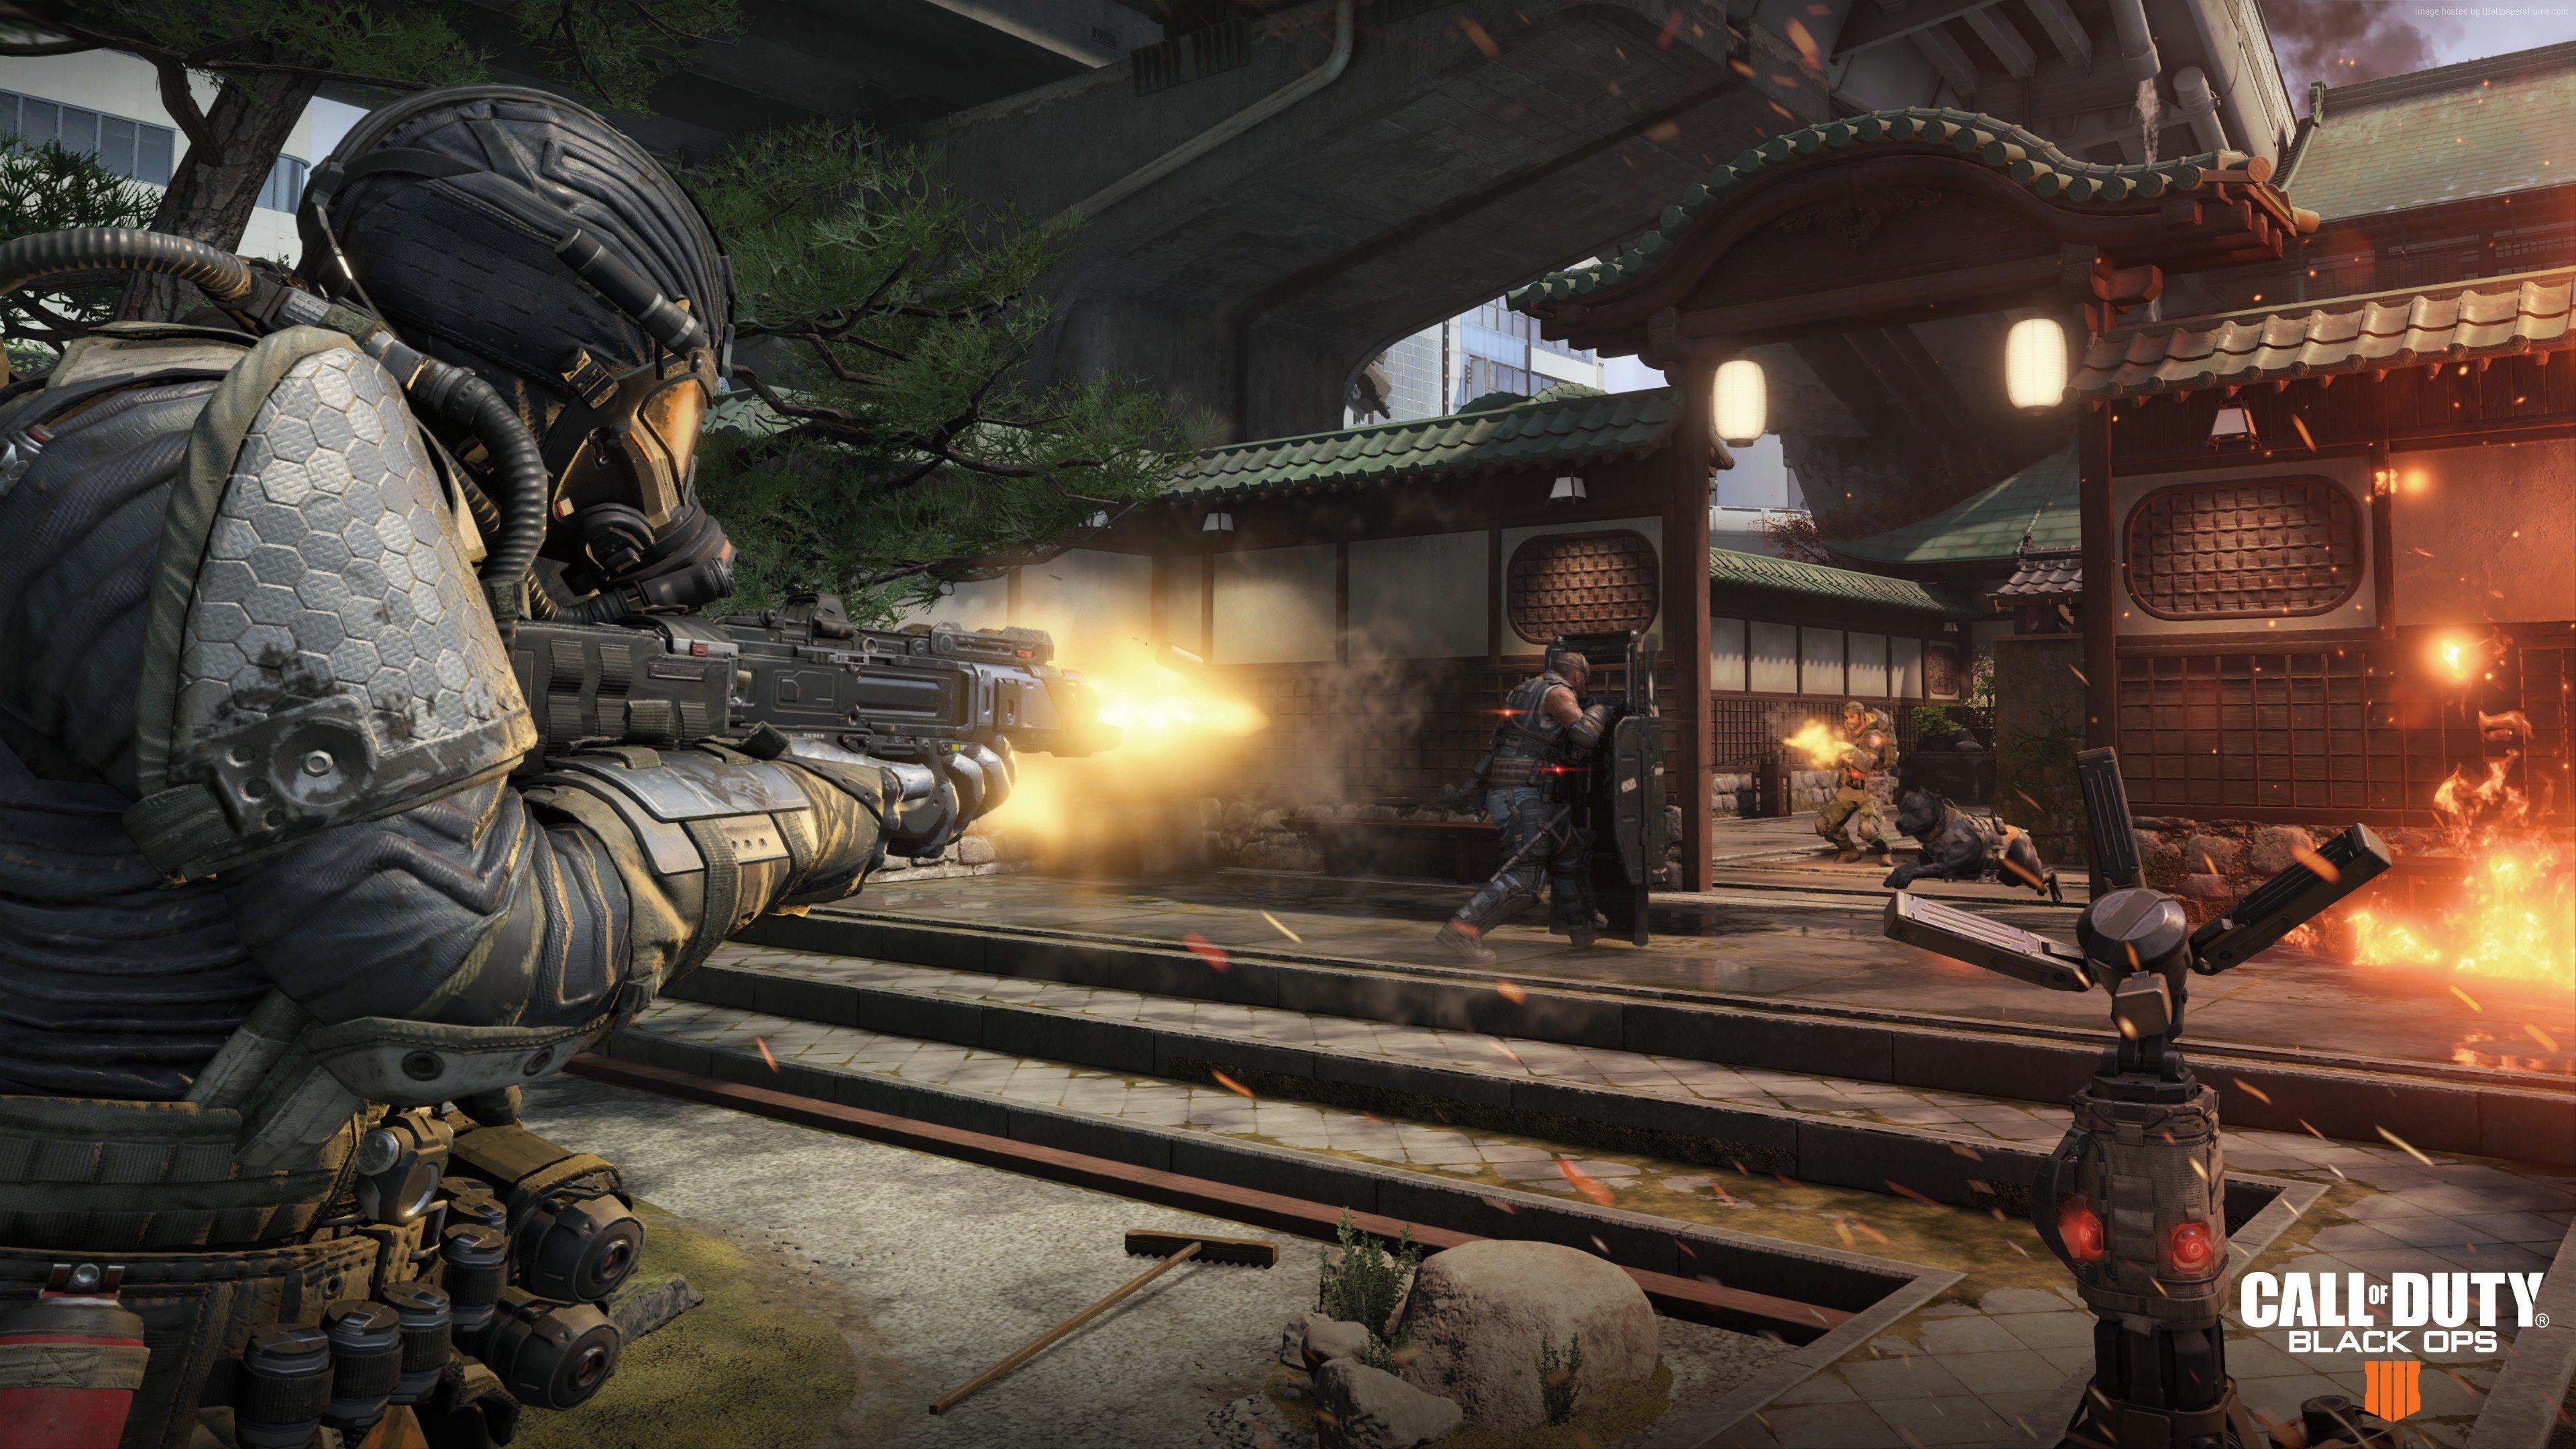 Wallpaper Call Of Duty Black Ops 4 Screenshot 4k Games Call